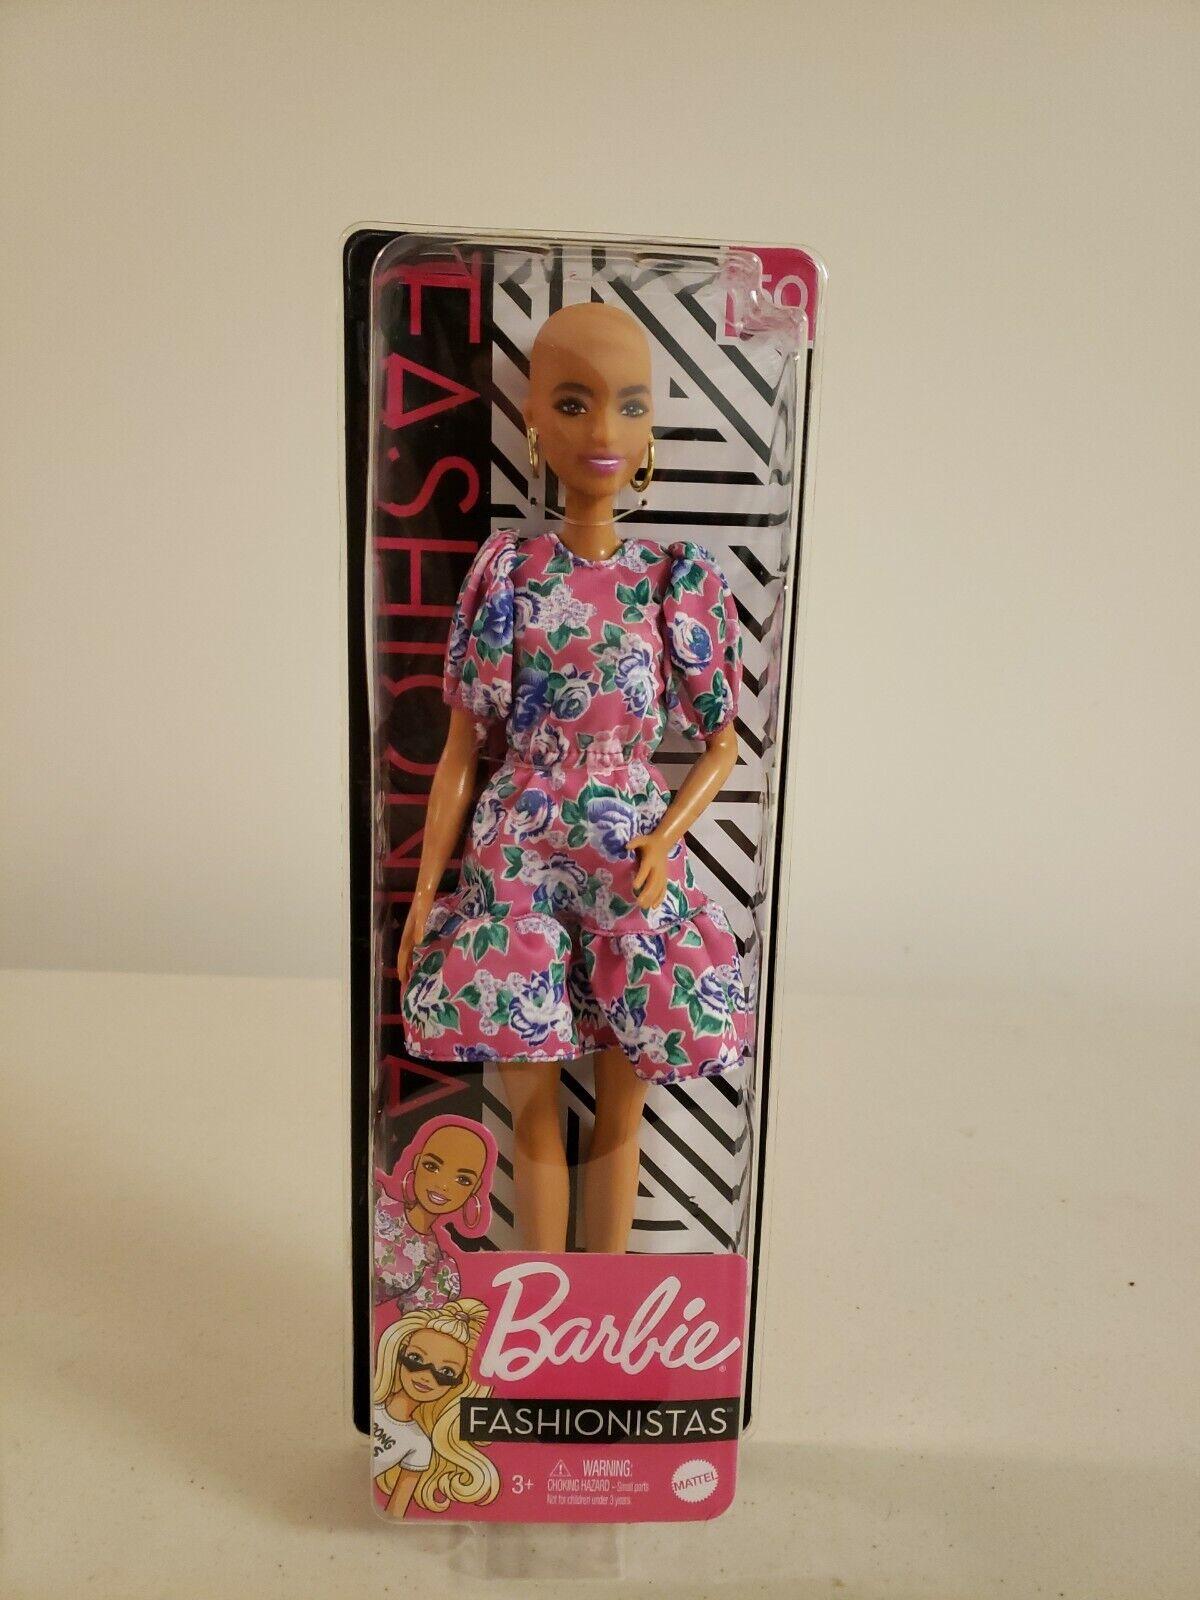 Cupcake Rosa Barbie Fashionista Bambola Accessorio FASHION Handbag Bag